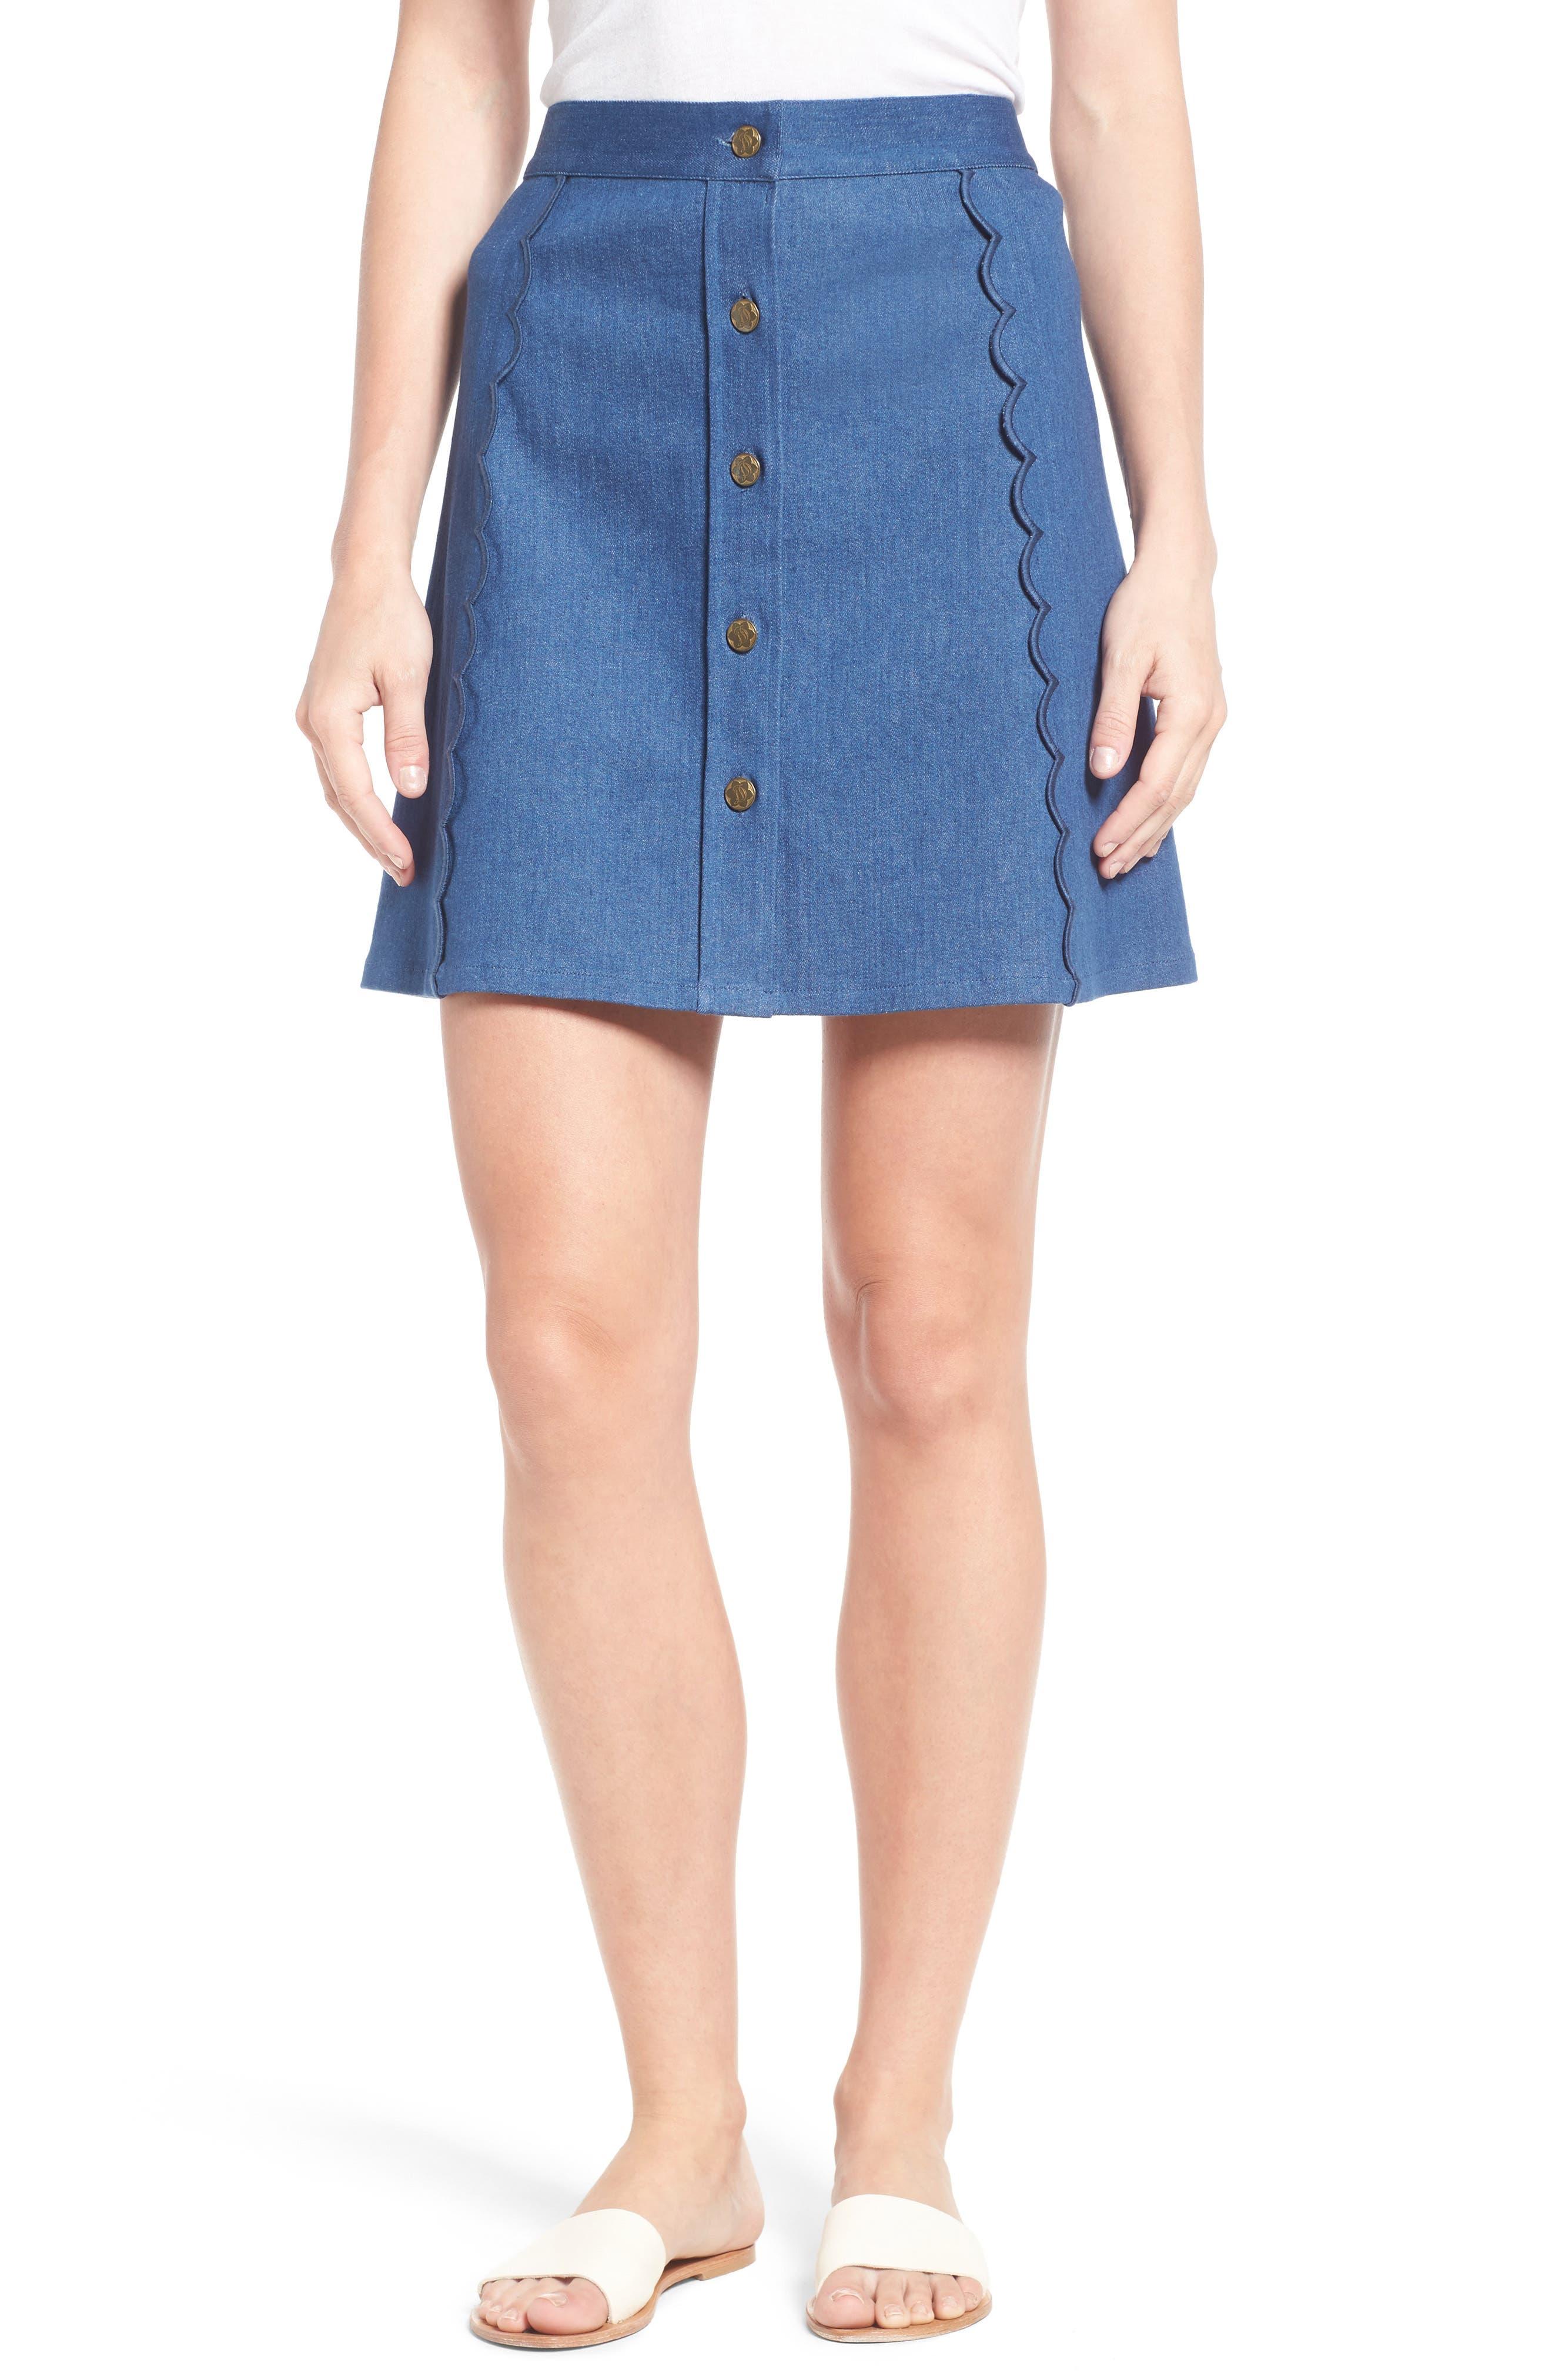 Alternate Image 1 Selected - Draper James Stretch Denim Miniskirt (Nordstrom Exclusive)